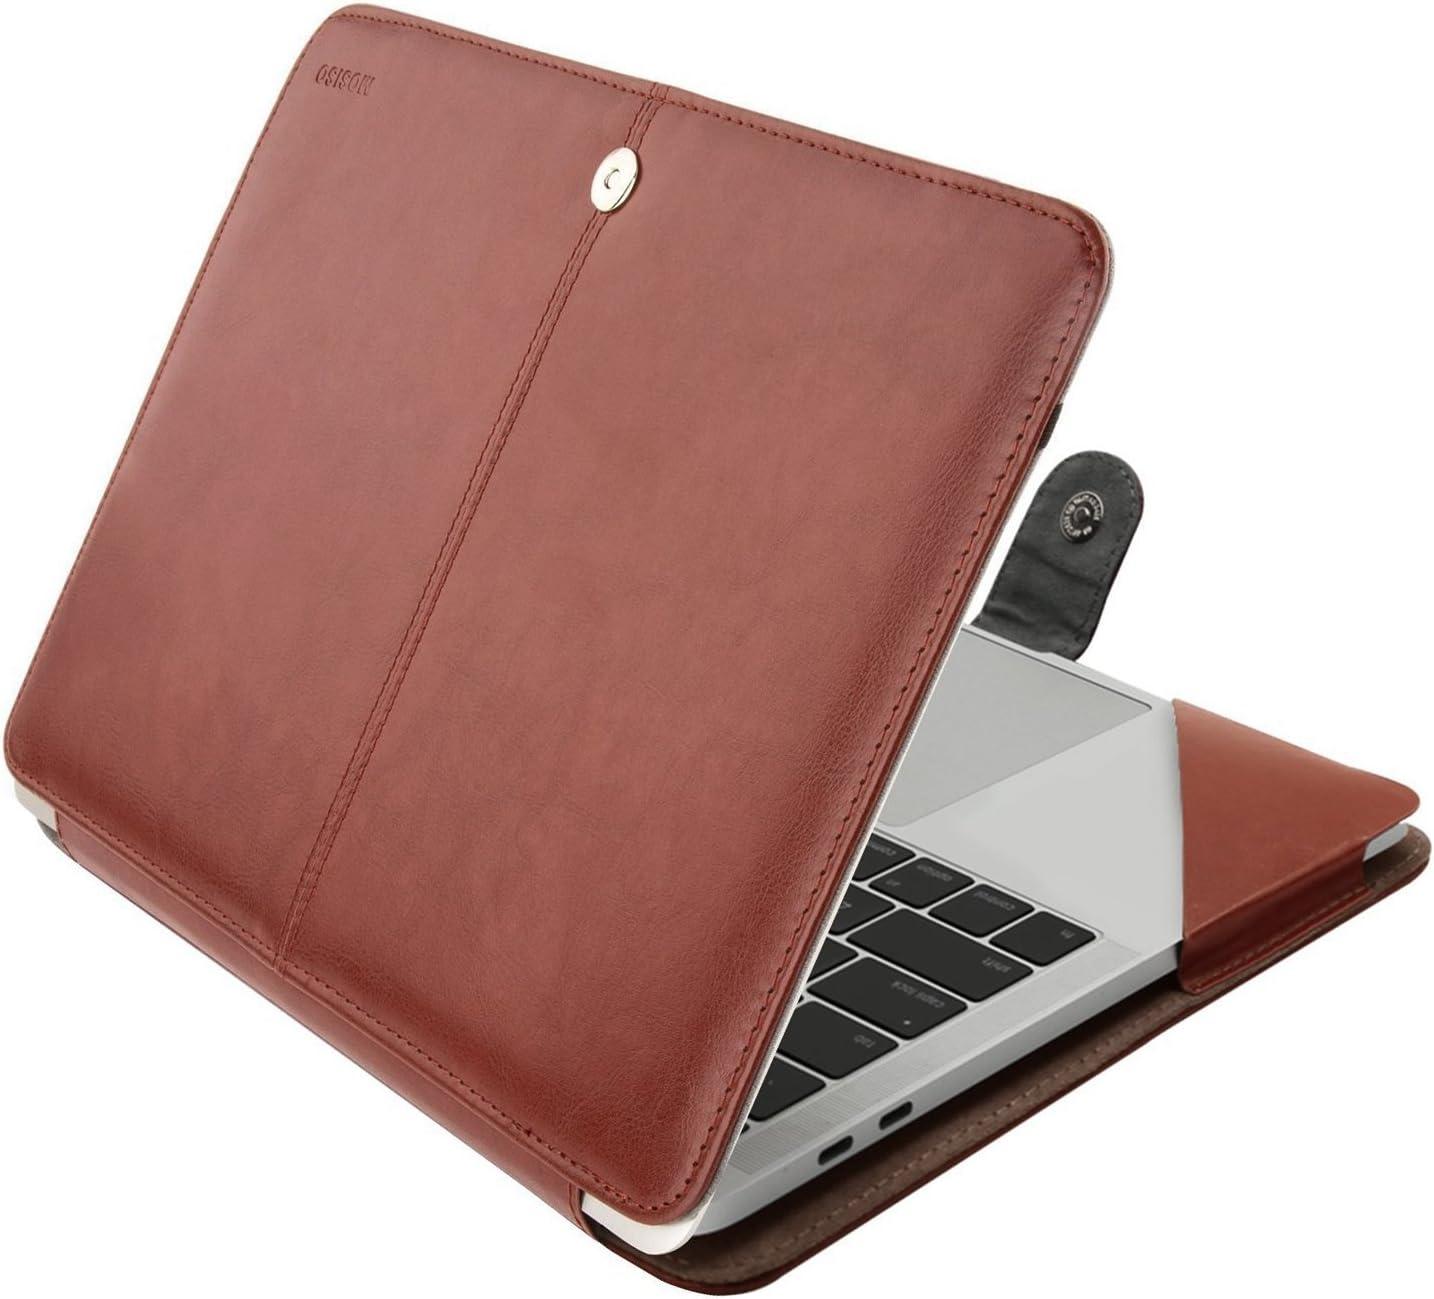 Pro M1 2020 Pro 15 MacBook Air M1 2020 Pro 13 Brown Leather MacBook Case Travel Apple Laptop Folio Cover Pro 16 Sleeve Air Retina